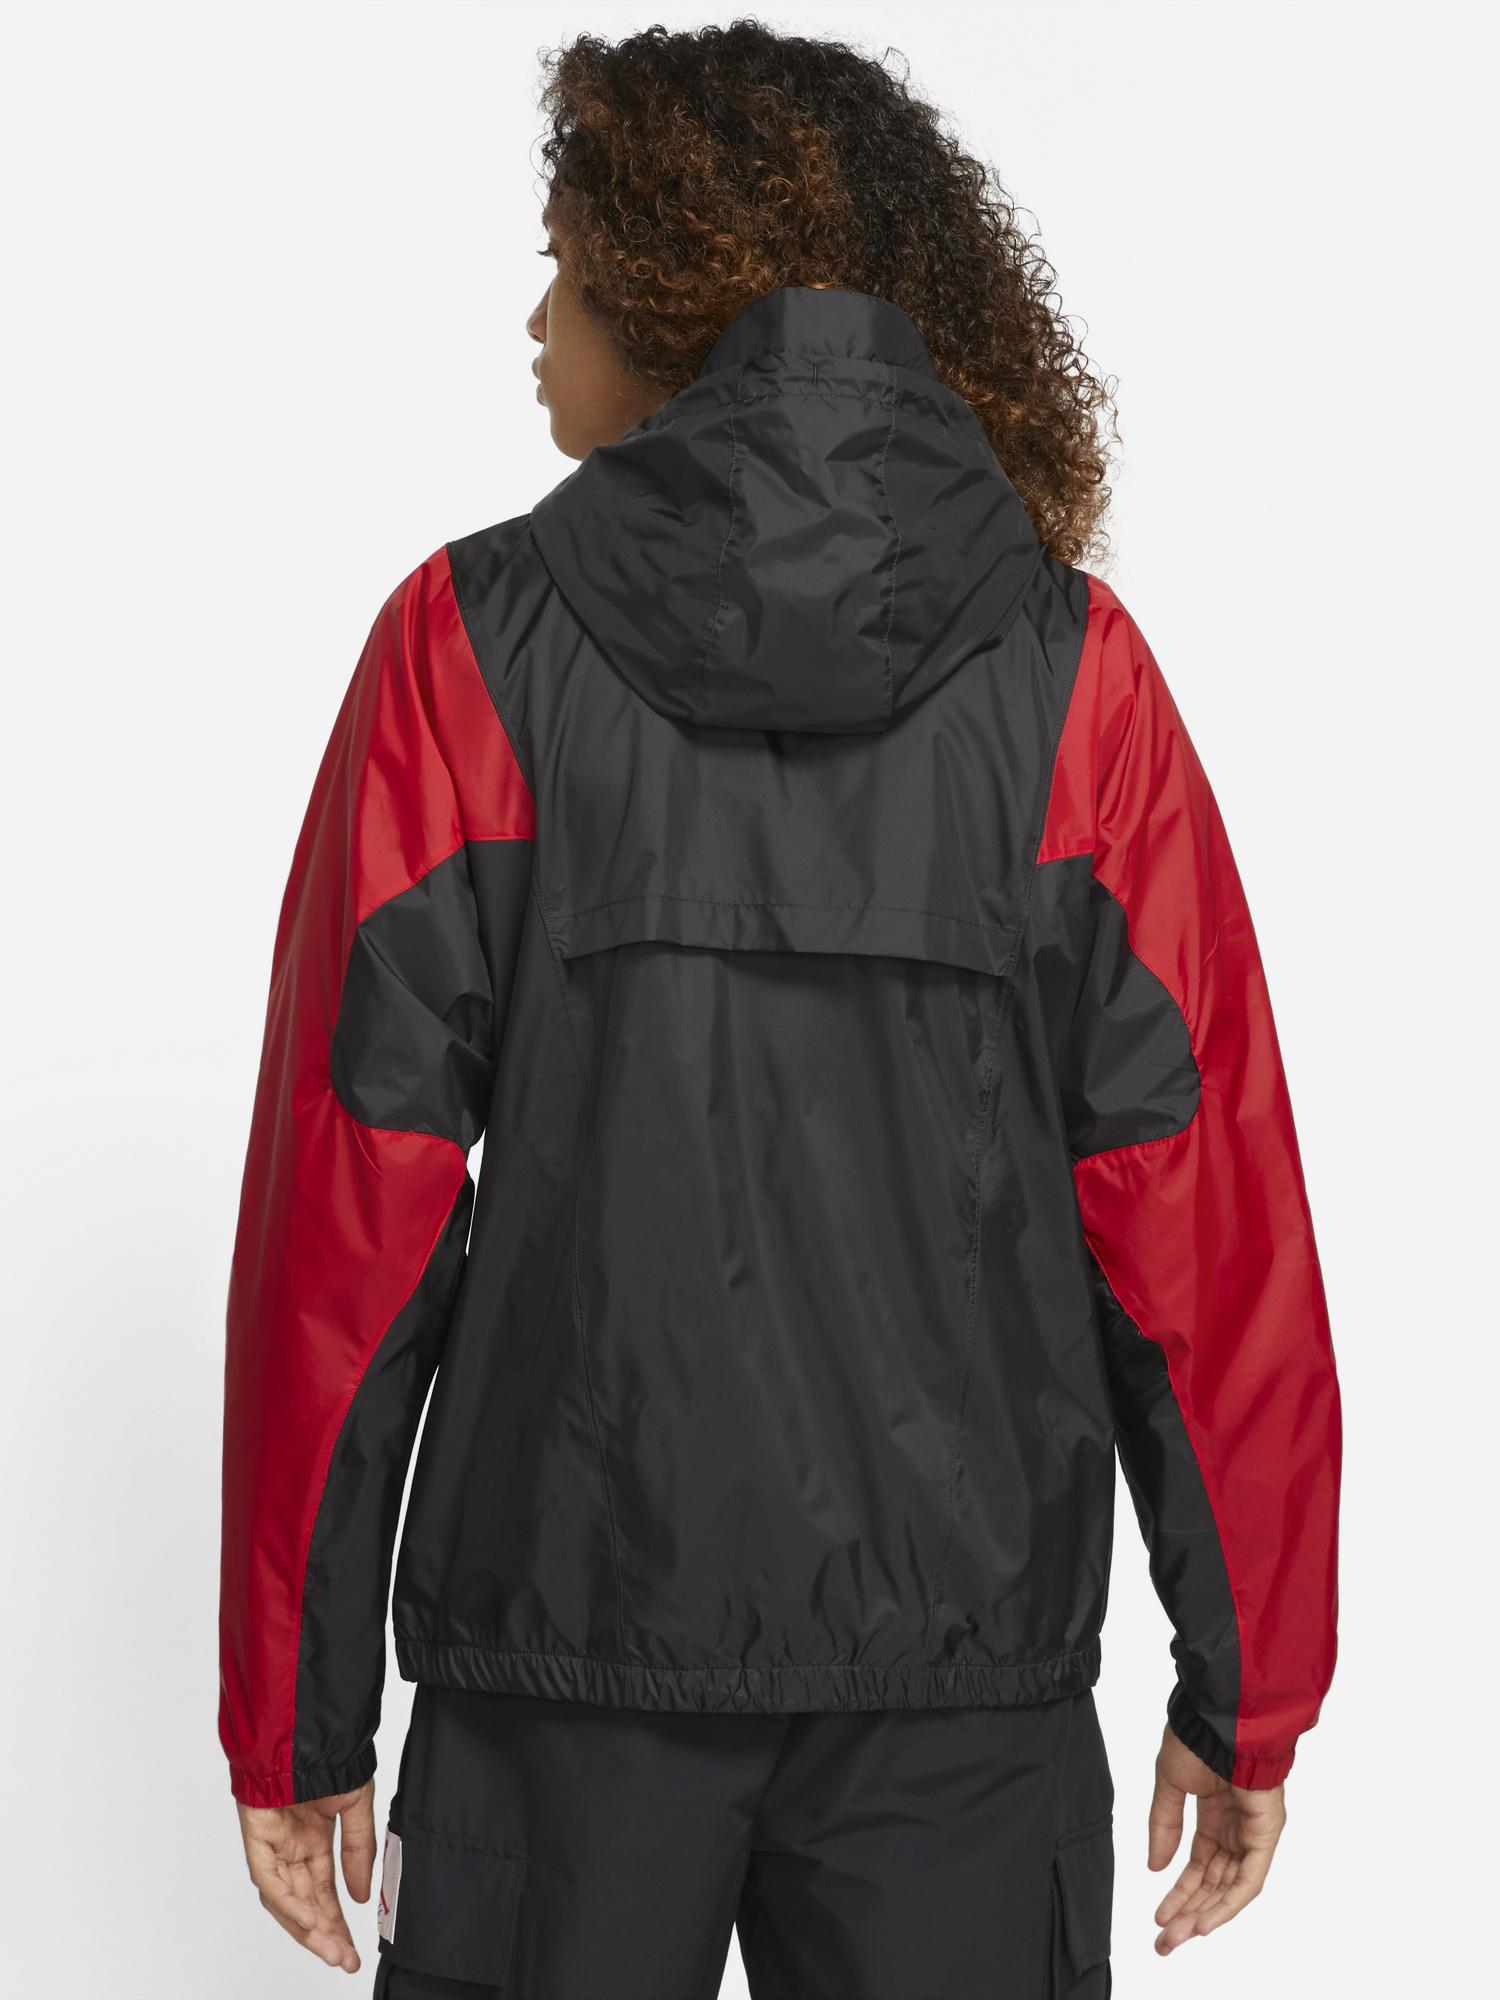 jordan-essential-woven-jacket-black-gym-red-2